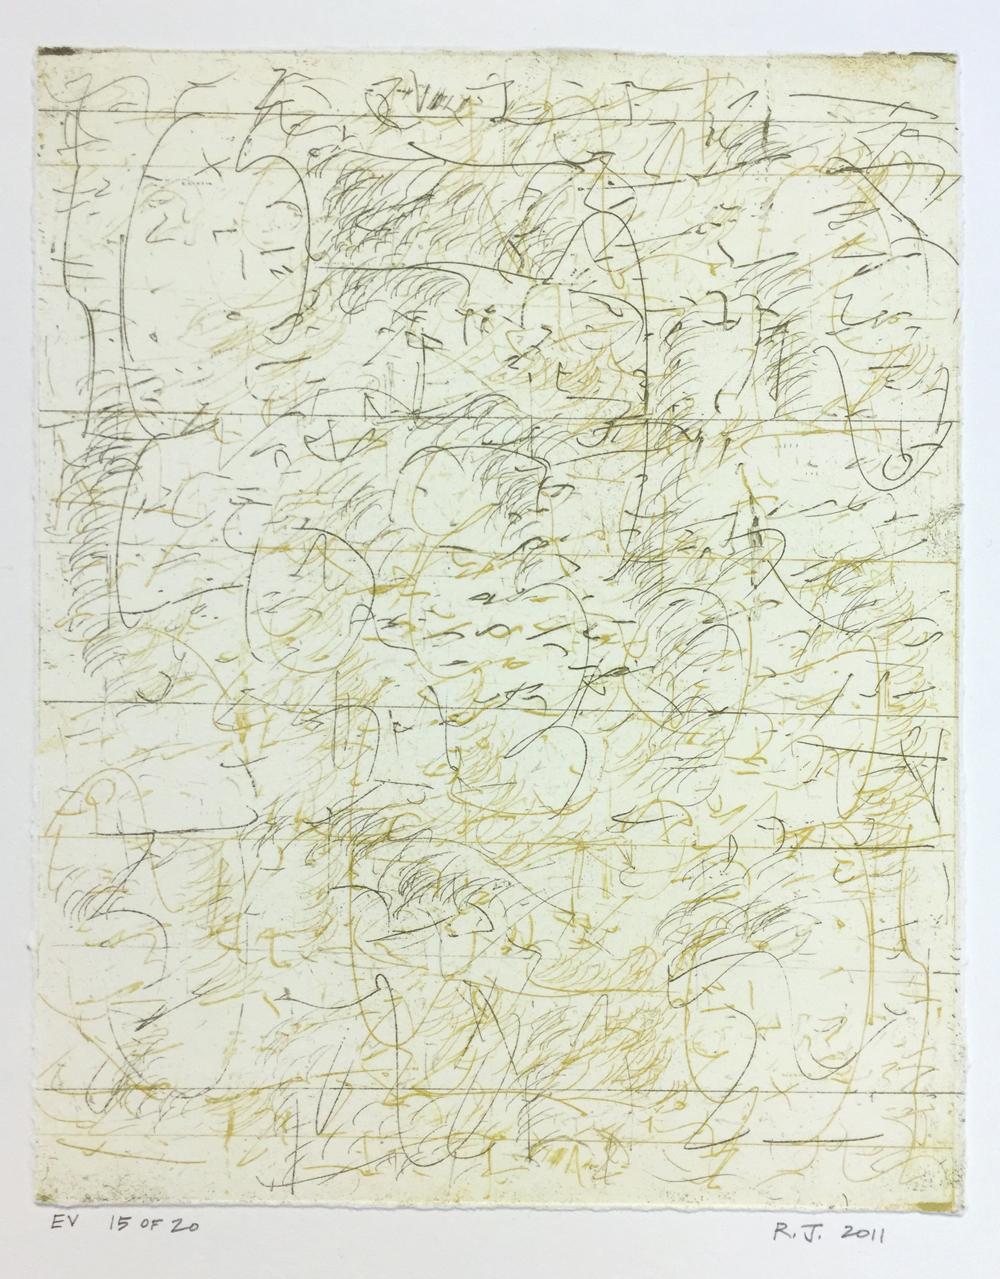 Robert C. Jones, EV, 2011, edition 15/20, etching, 10 x 7.75 inches, $600.